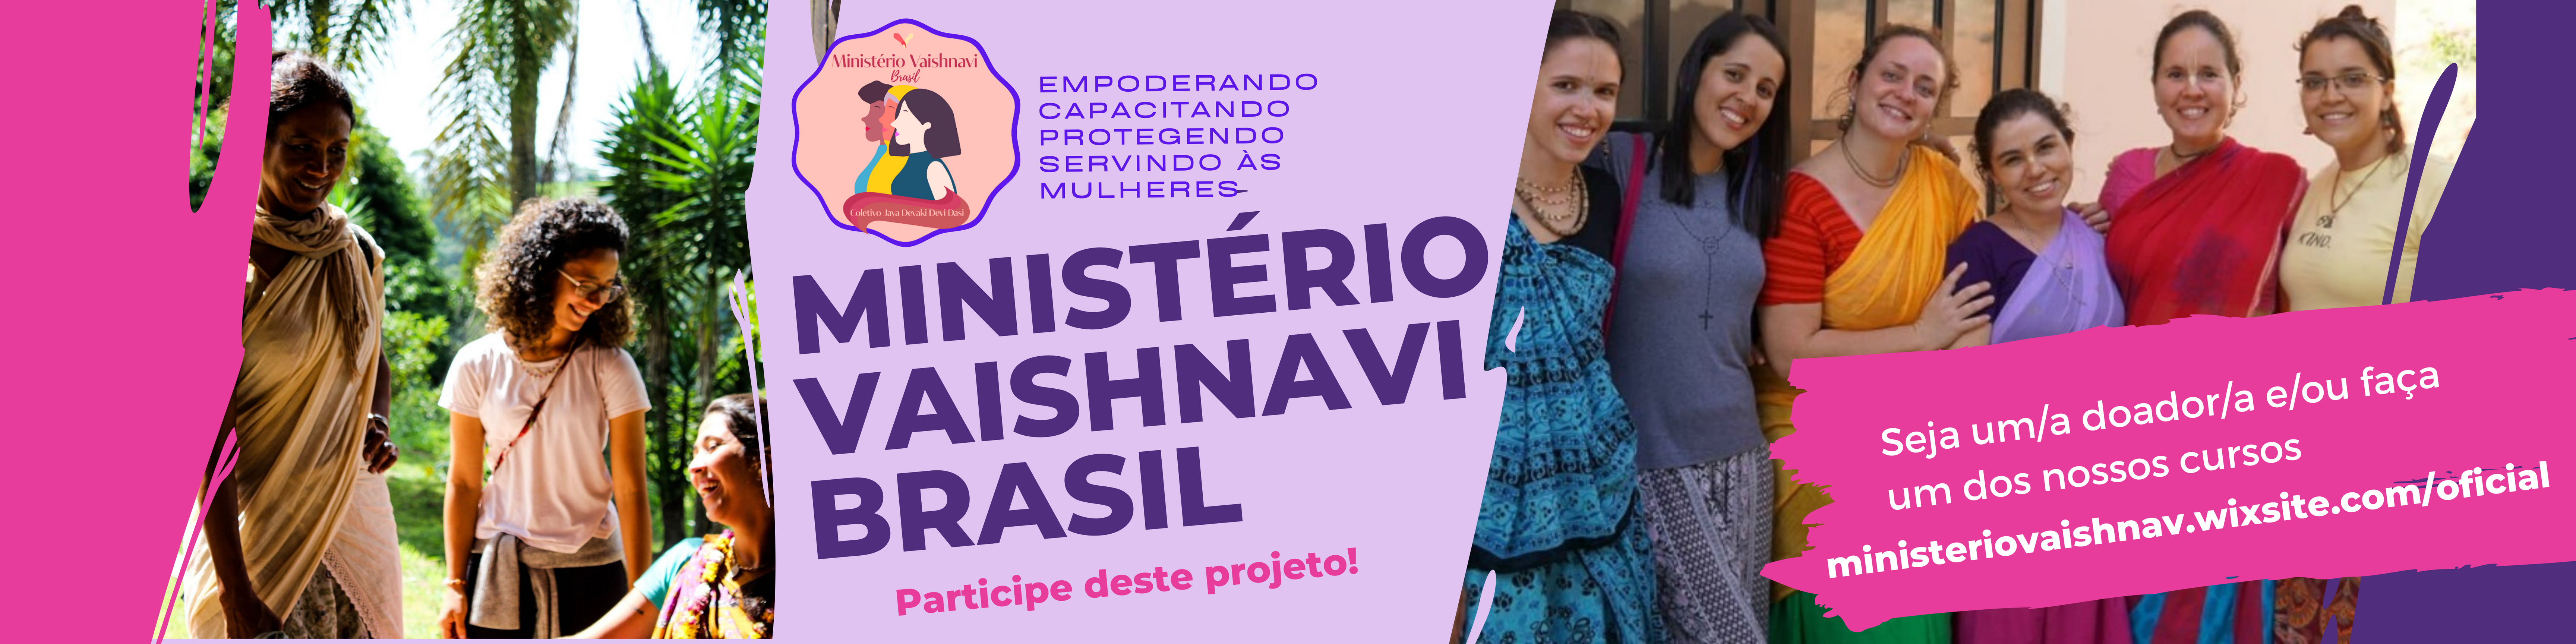 Ministério Vaishnavi Brasil